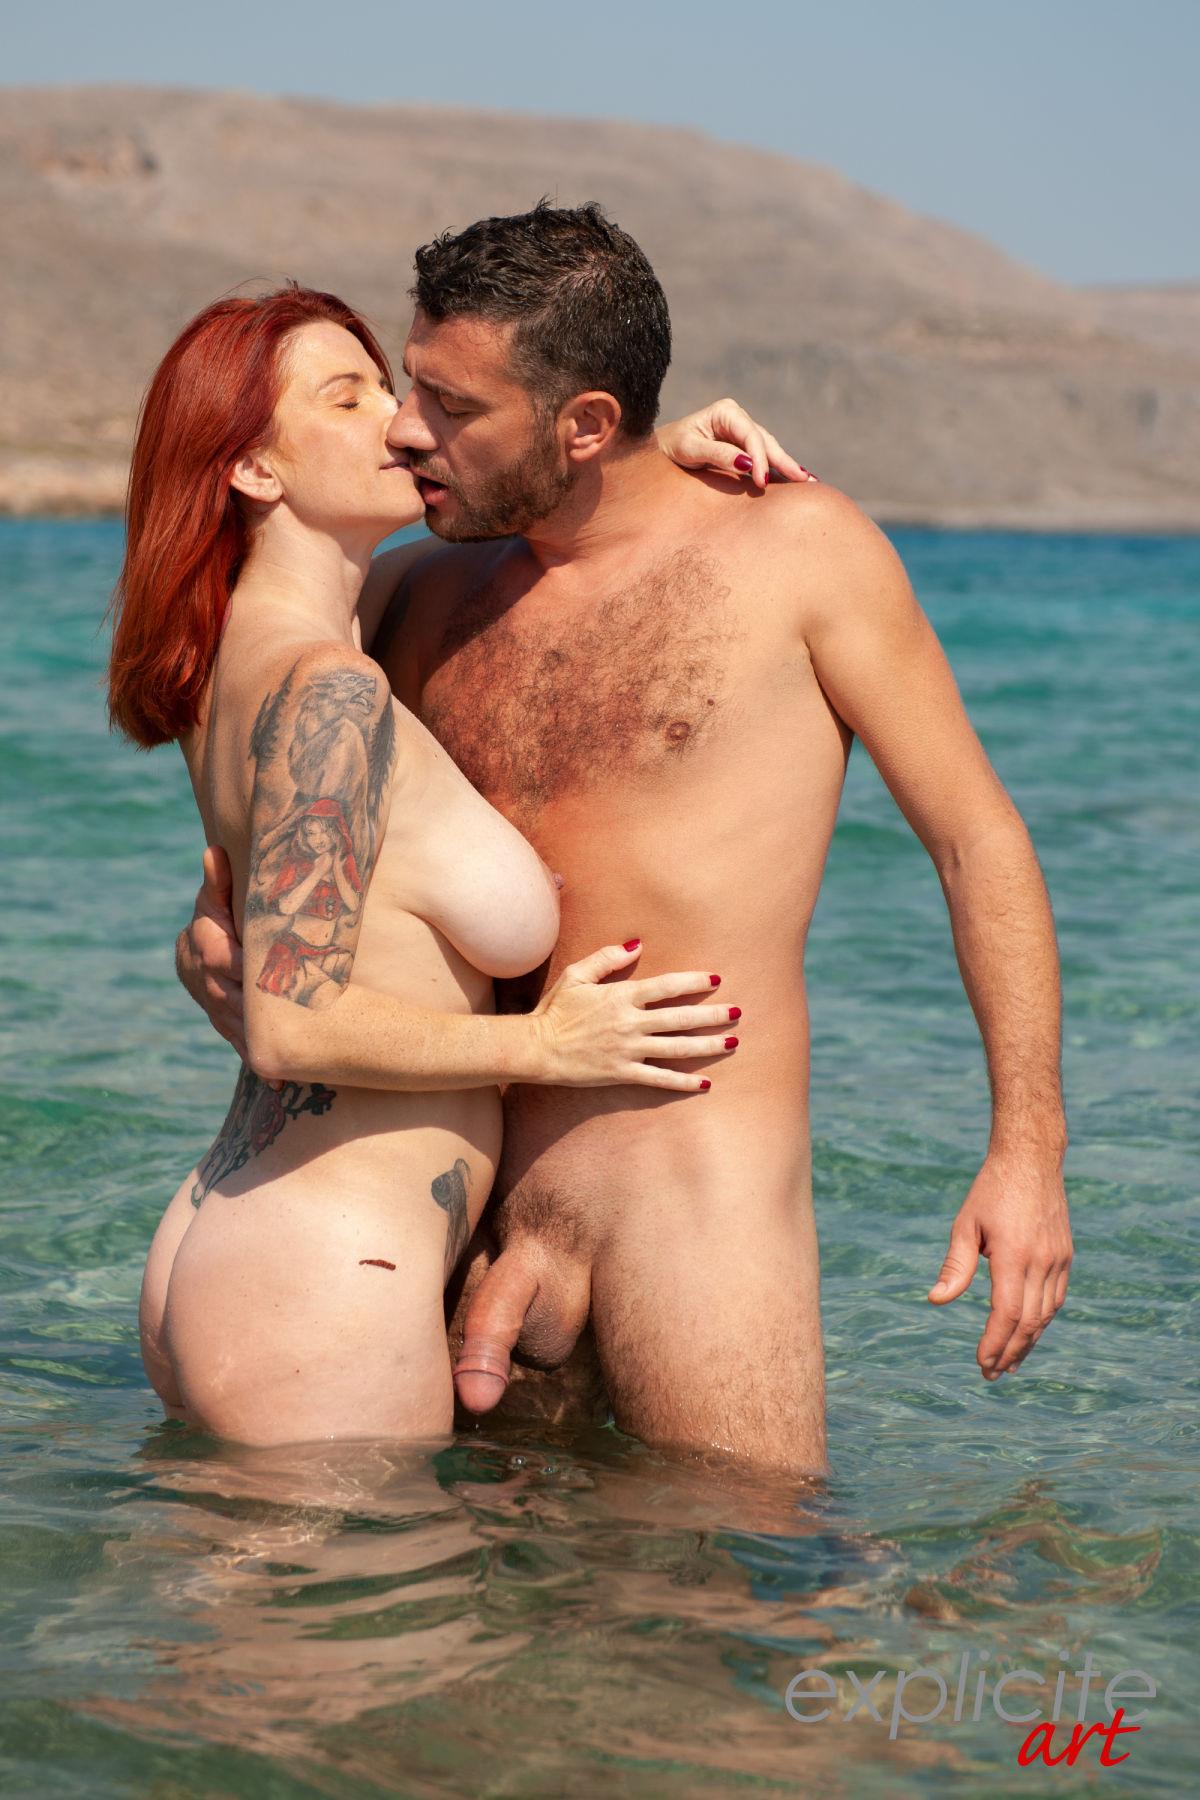 Canadiansexymovie Large Porn Chubby Nude Sunbathing